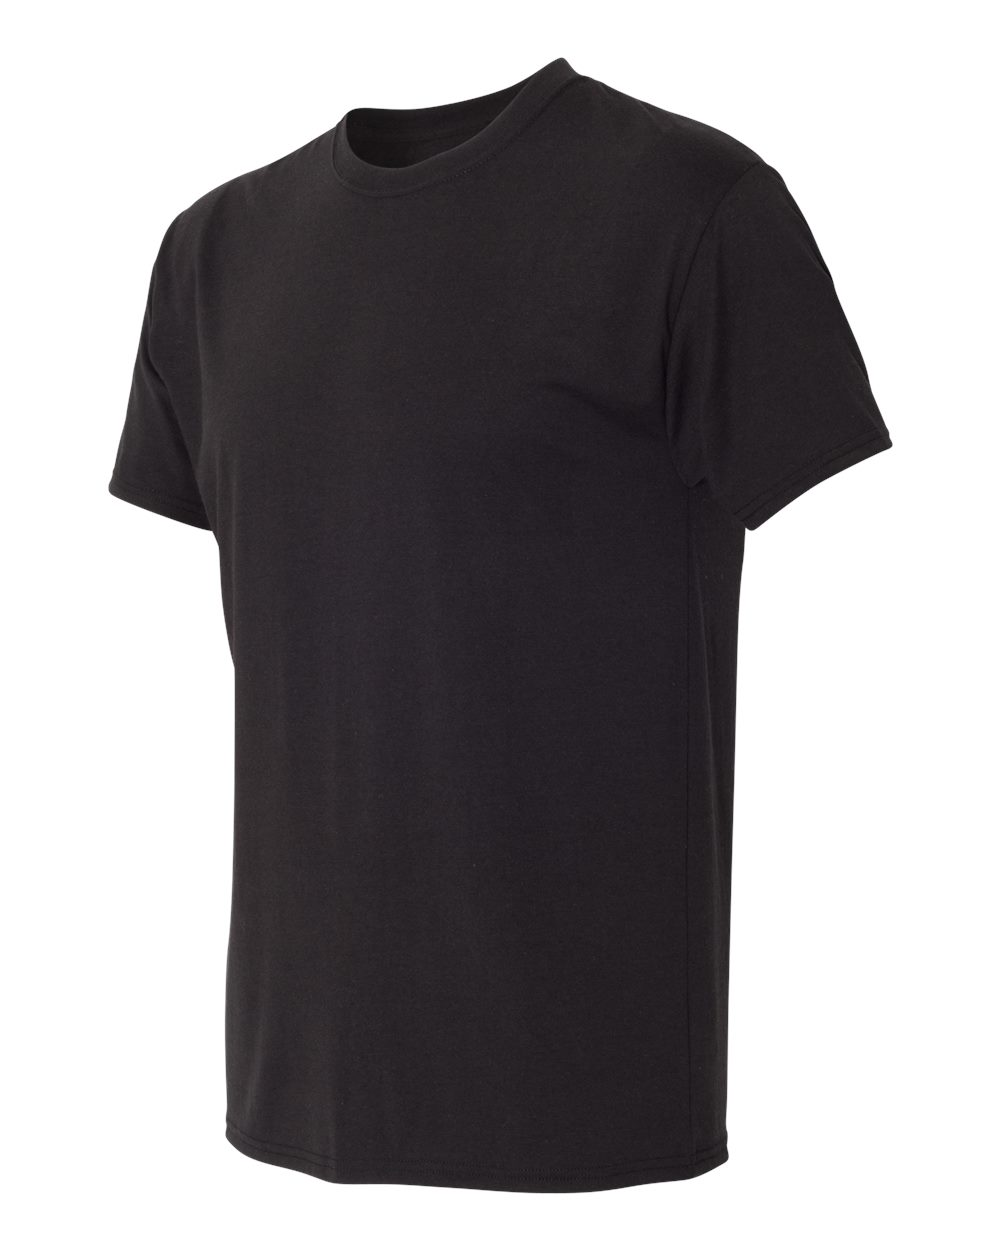 Hanes-Men-039-s-X-Temp-Triblend-T-Shirt-With-Fresh-Iq-42TB-S-3XL thumbnail 3